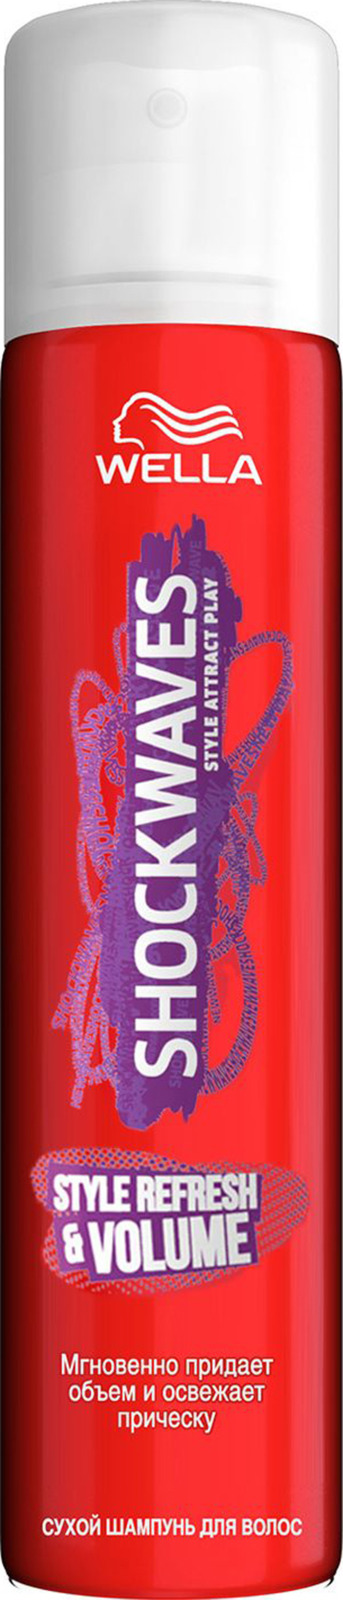 Сухой шампунь для волос Wella Shockwaves Style Refresh& Volume, 65мл Wella